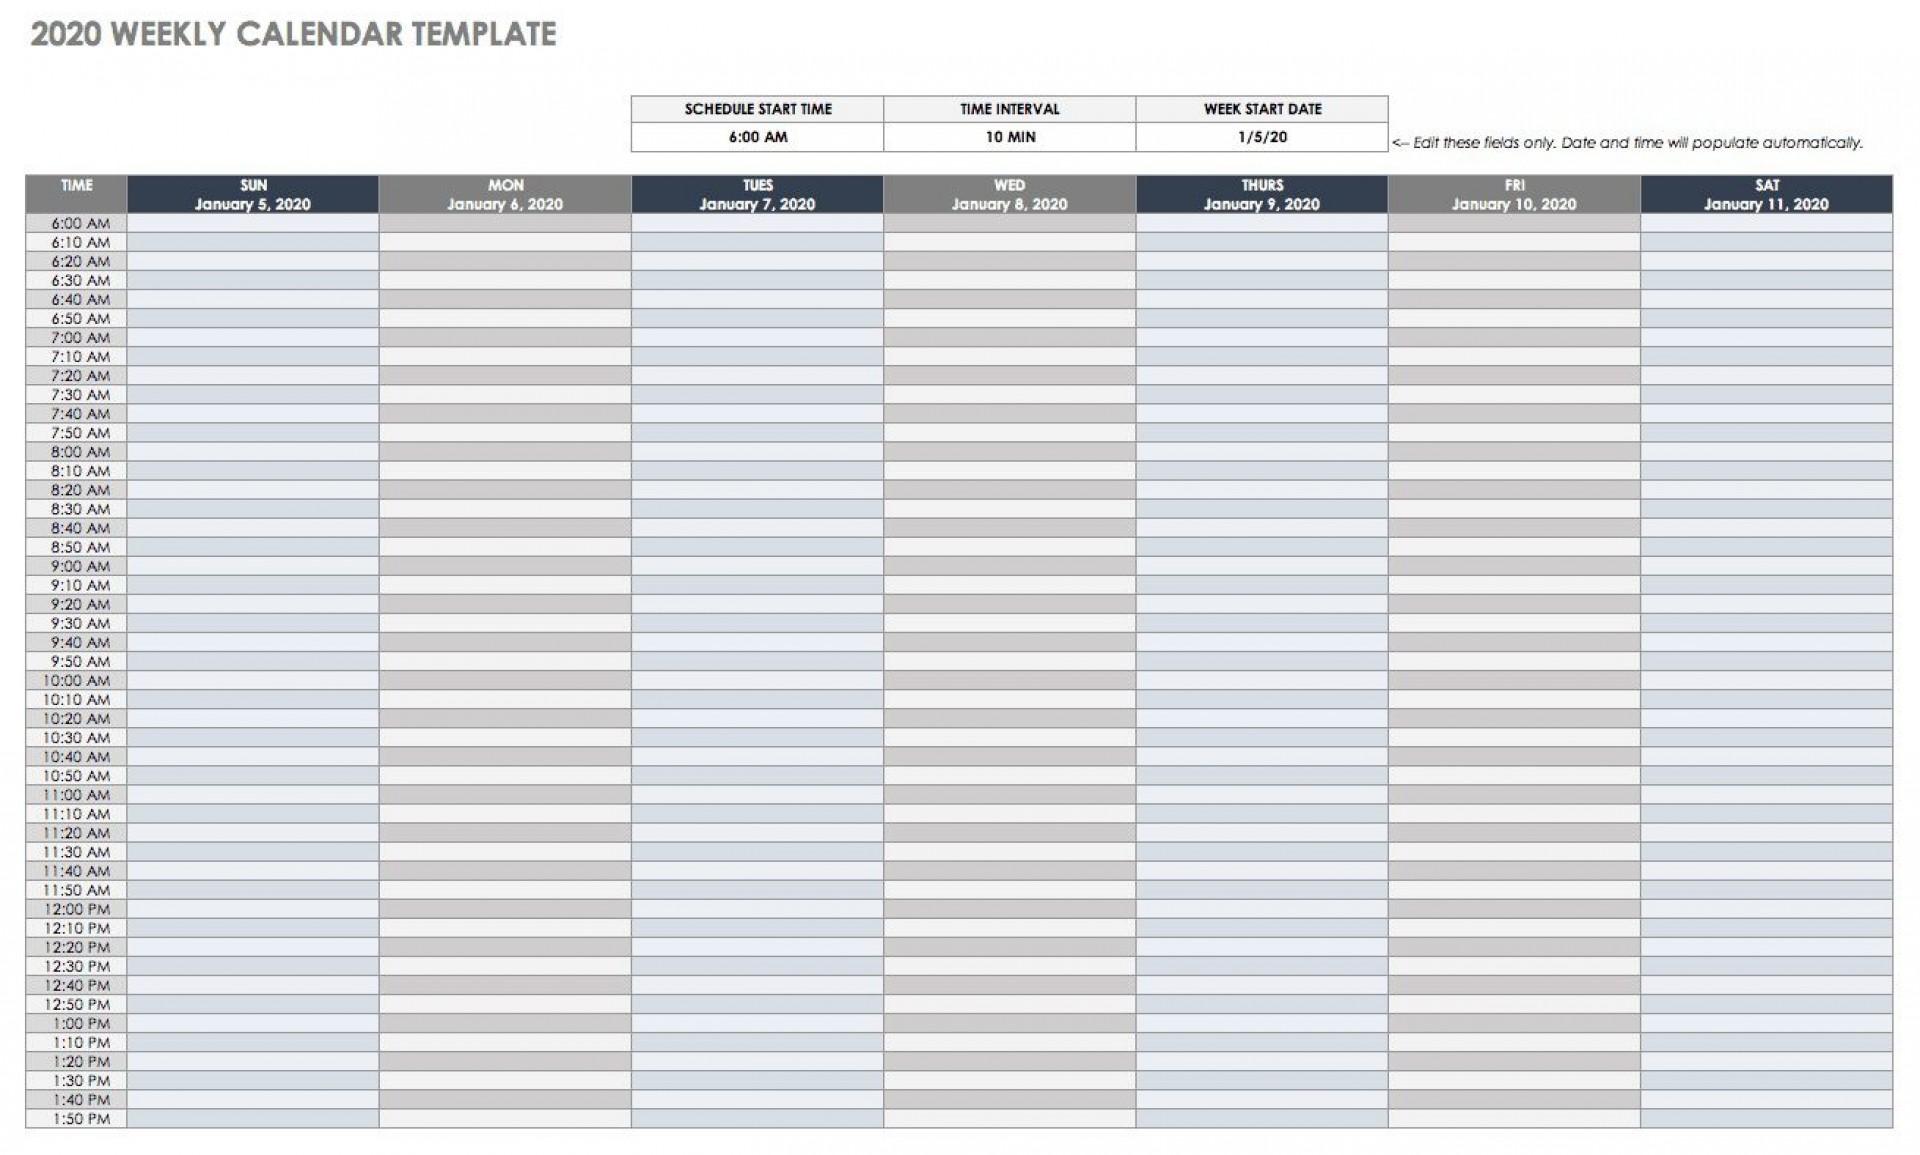 006 Surprising Google Doc Calendar Template 2020 Highest Clarity  Drive Sheet Weekly1920